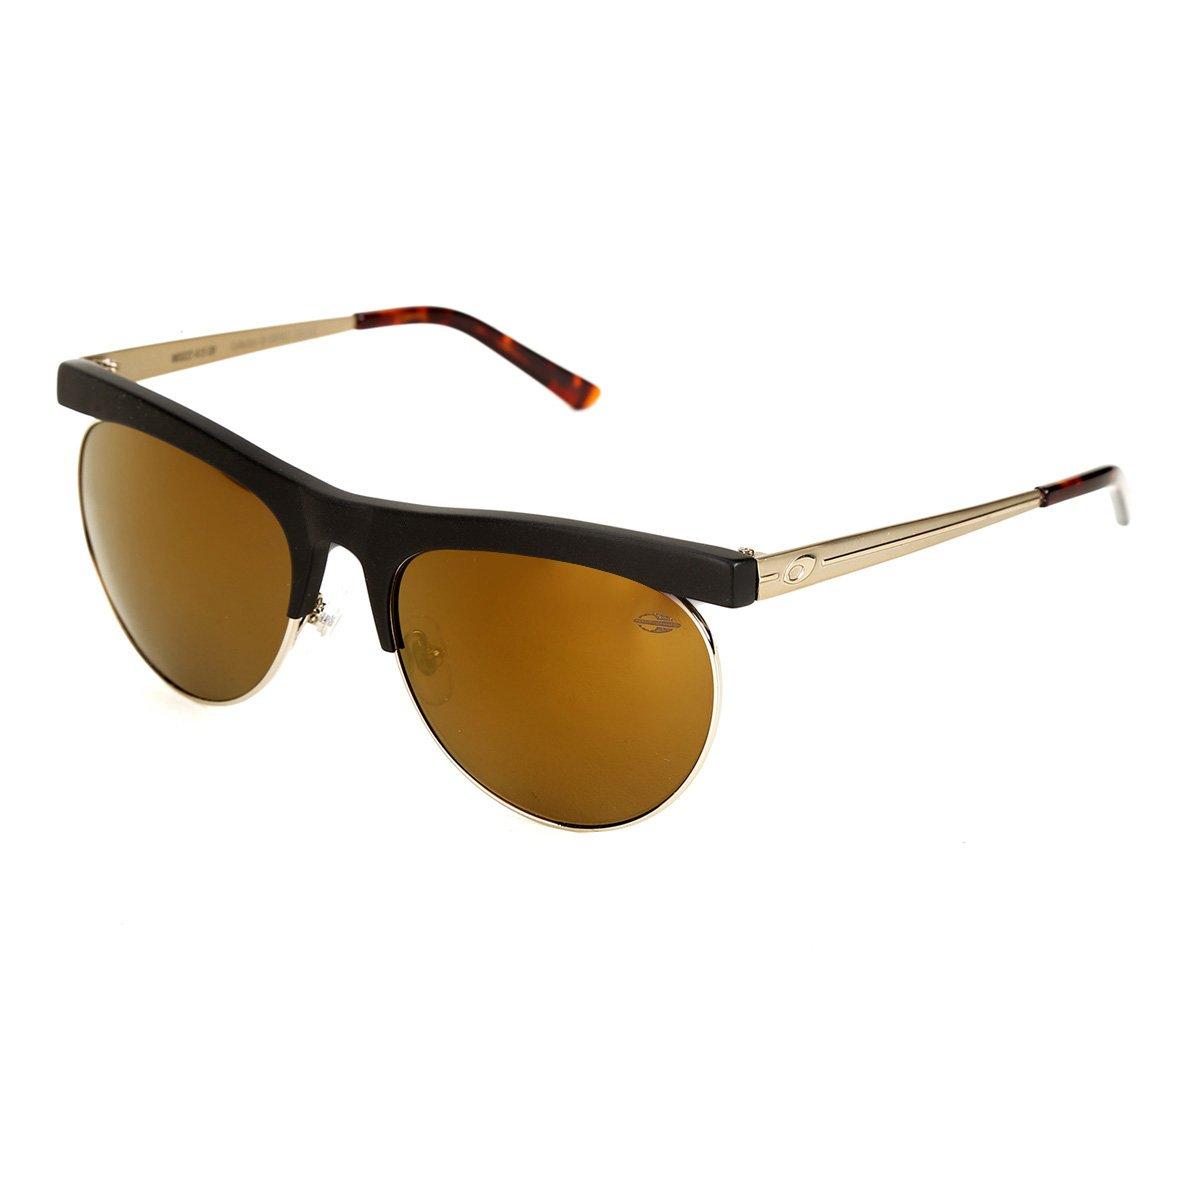 Óculos de Sol Mormaii M0022A1508 Fosco Feminino. undefined 9408013d56